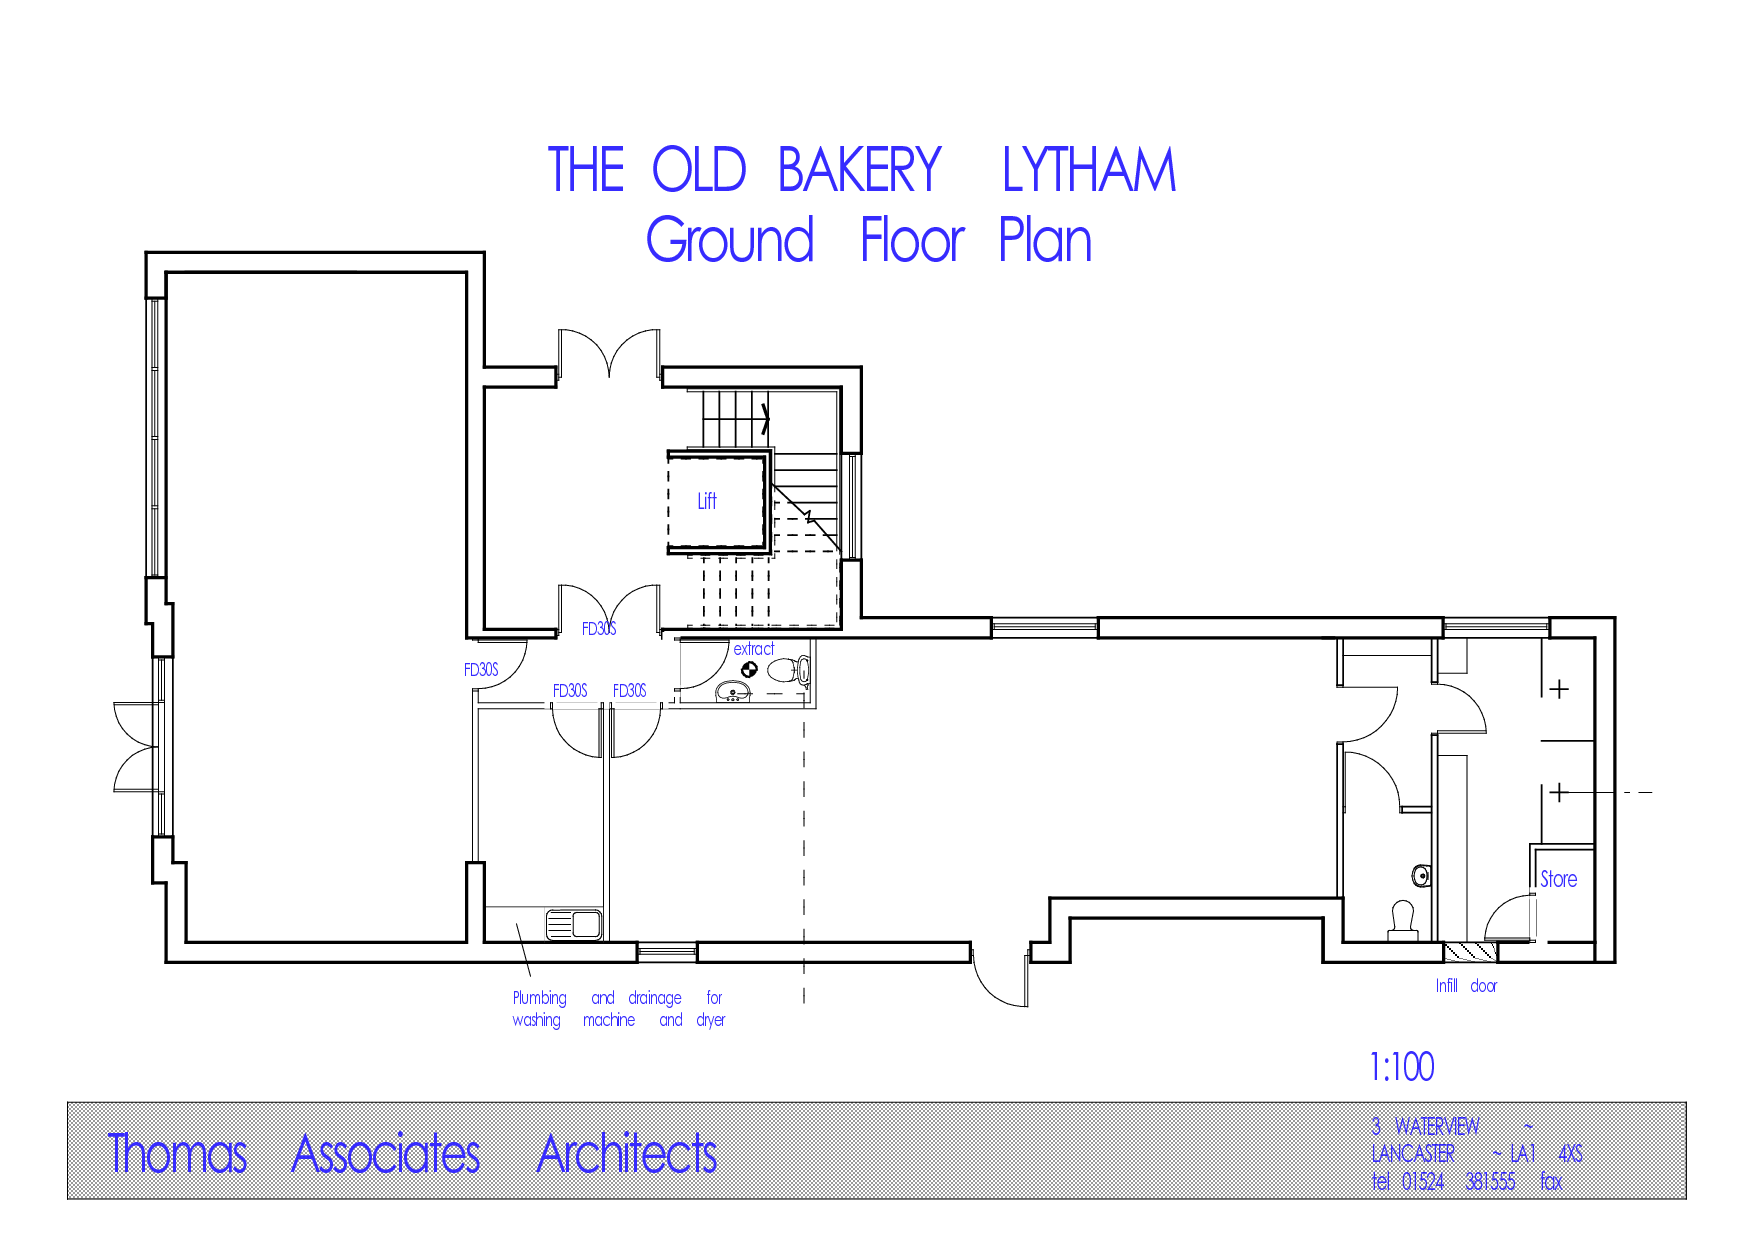 bakery layout floor plan cakepins com ideas for the house